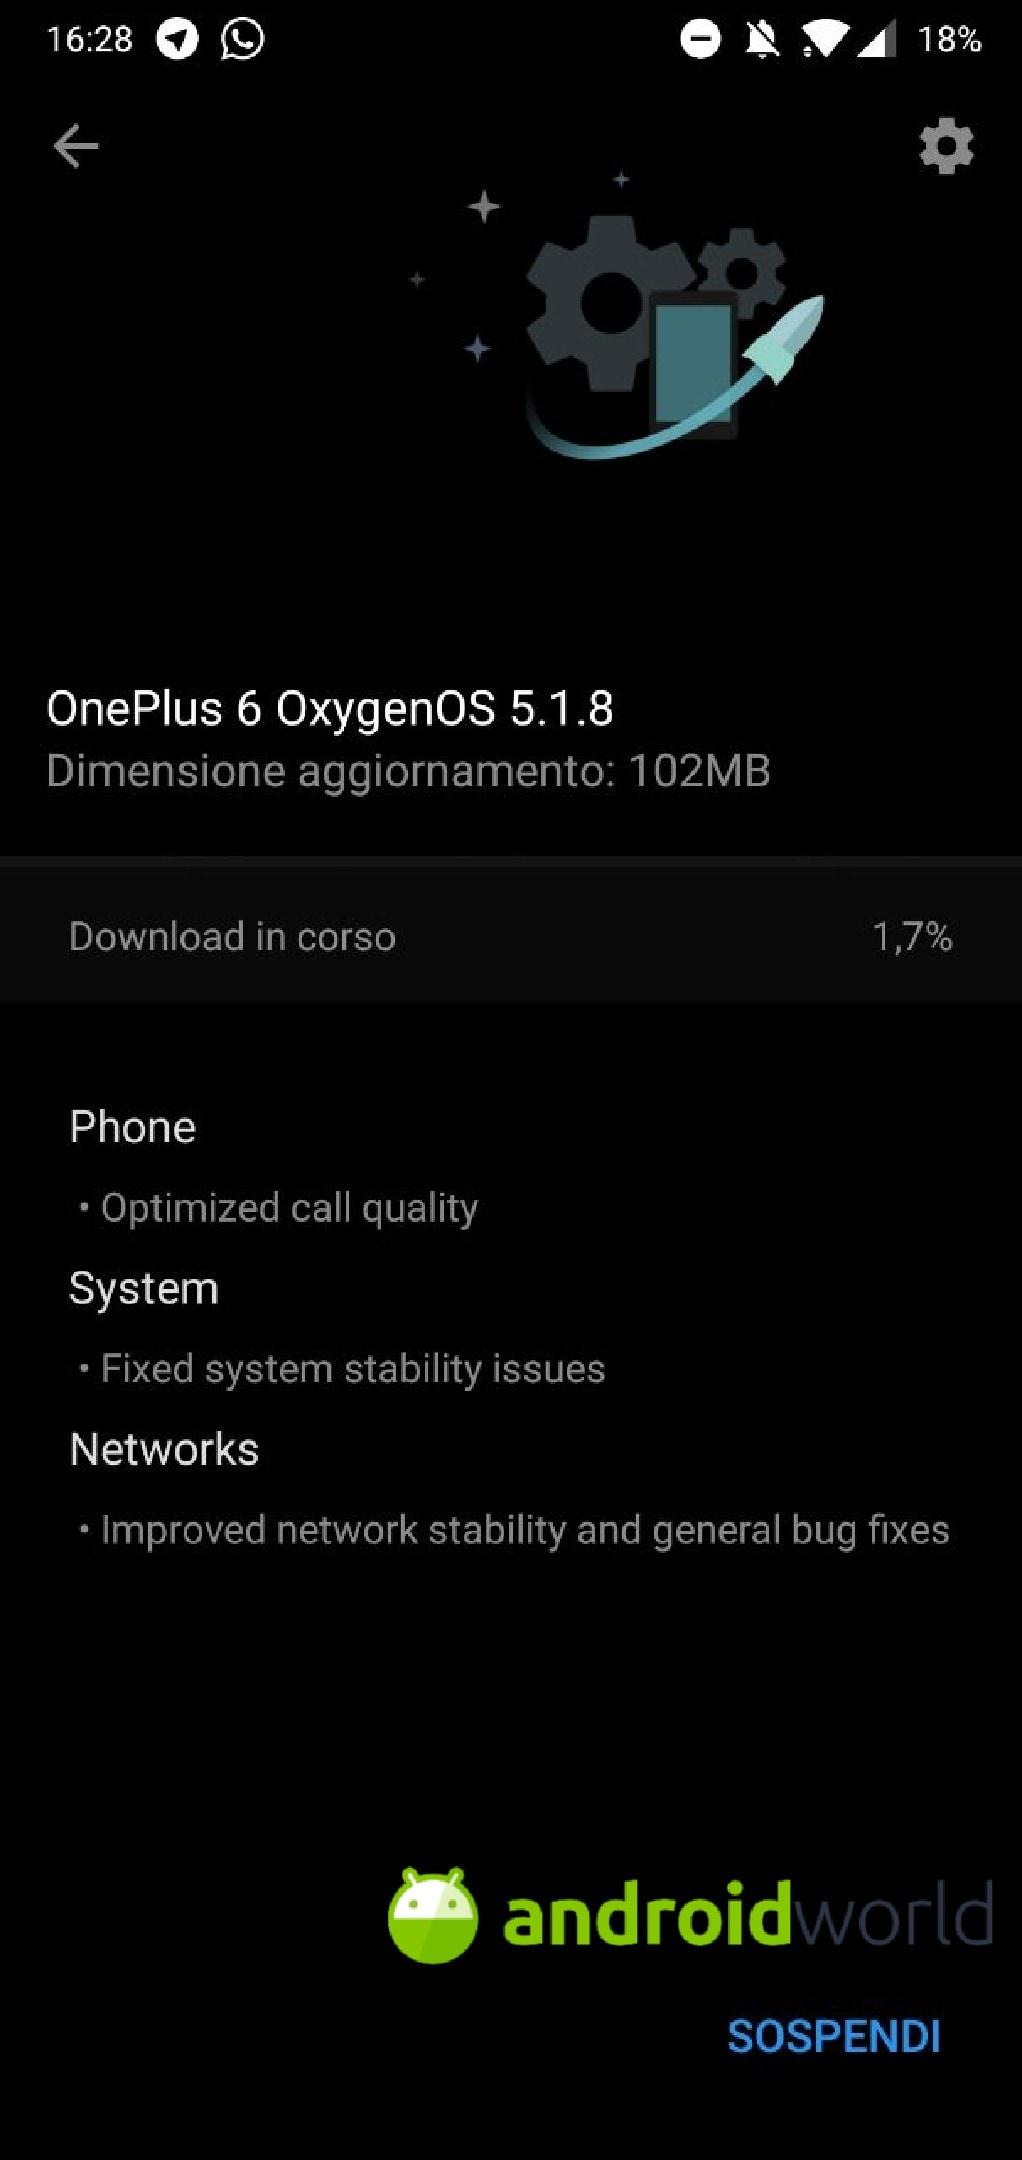 oneplus 6 oxygen 5.1.8